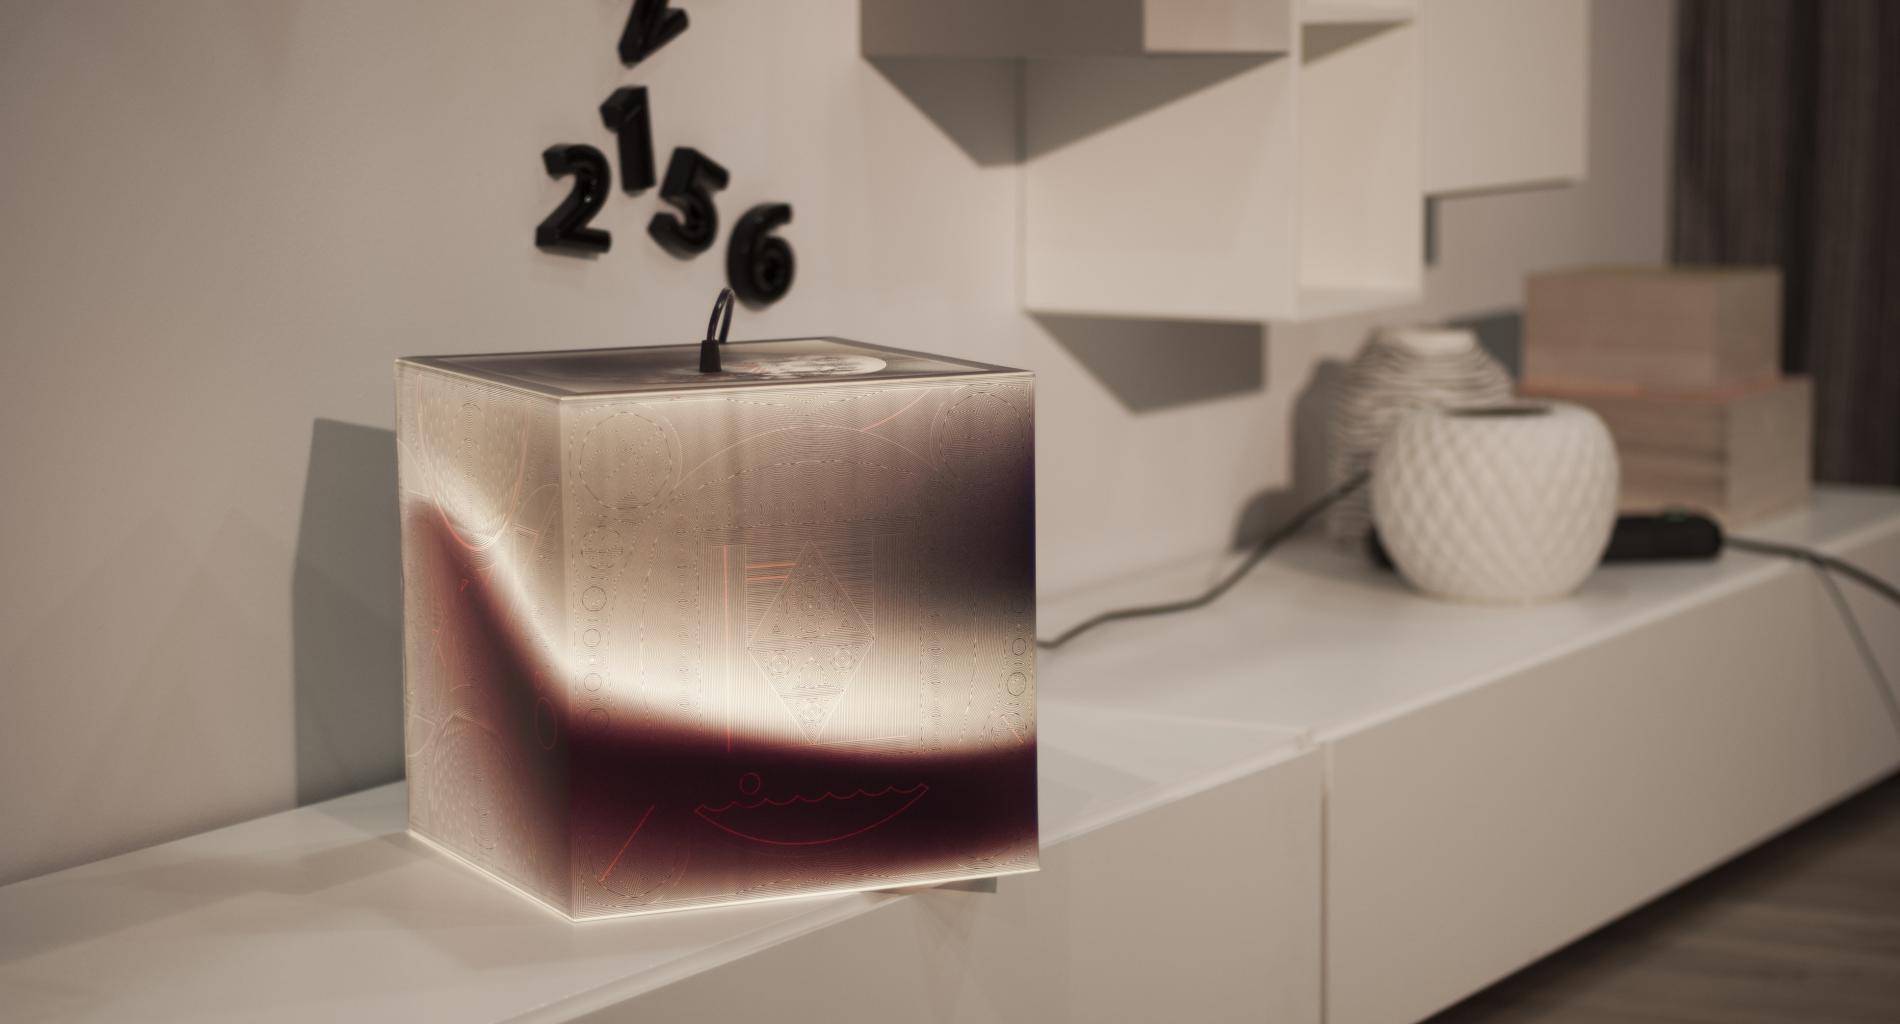 Light up your night mood lamp | UNIQCUBE